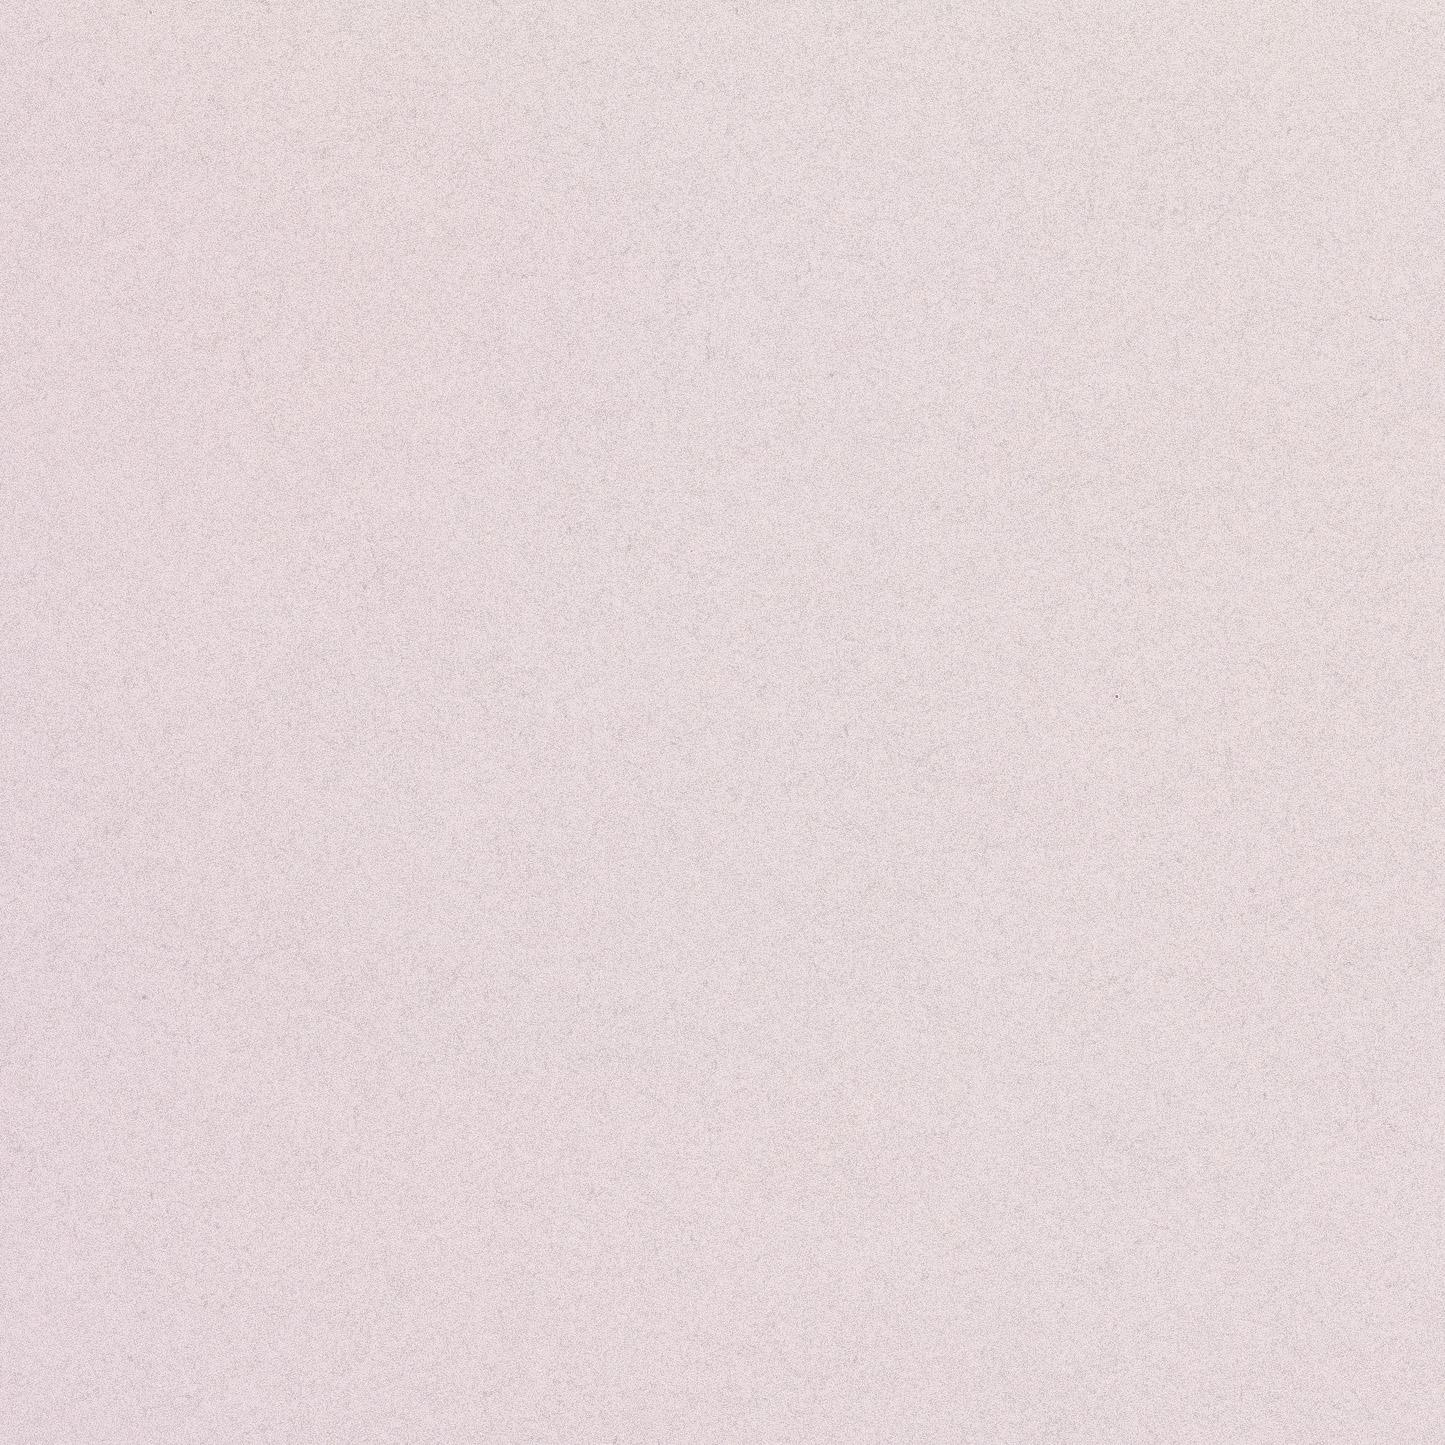 Translucent - Baby Pink 100gsm